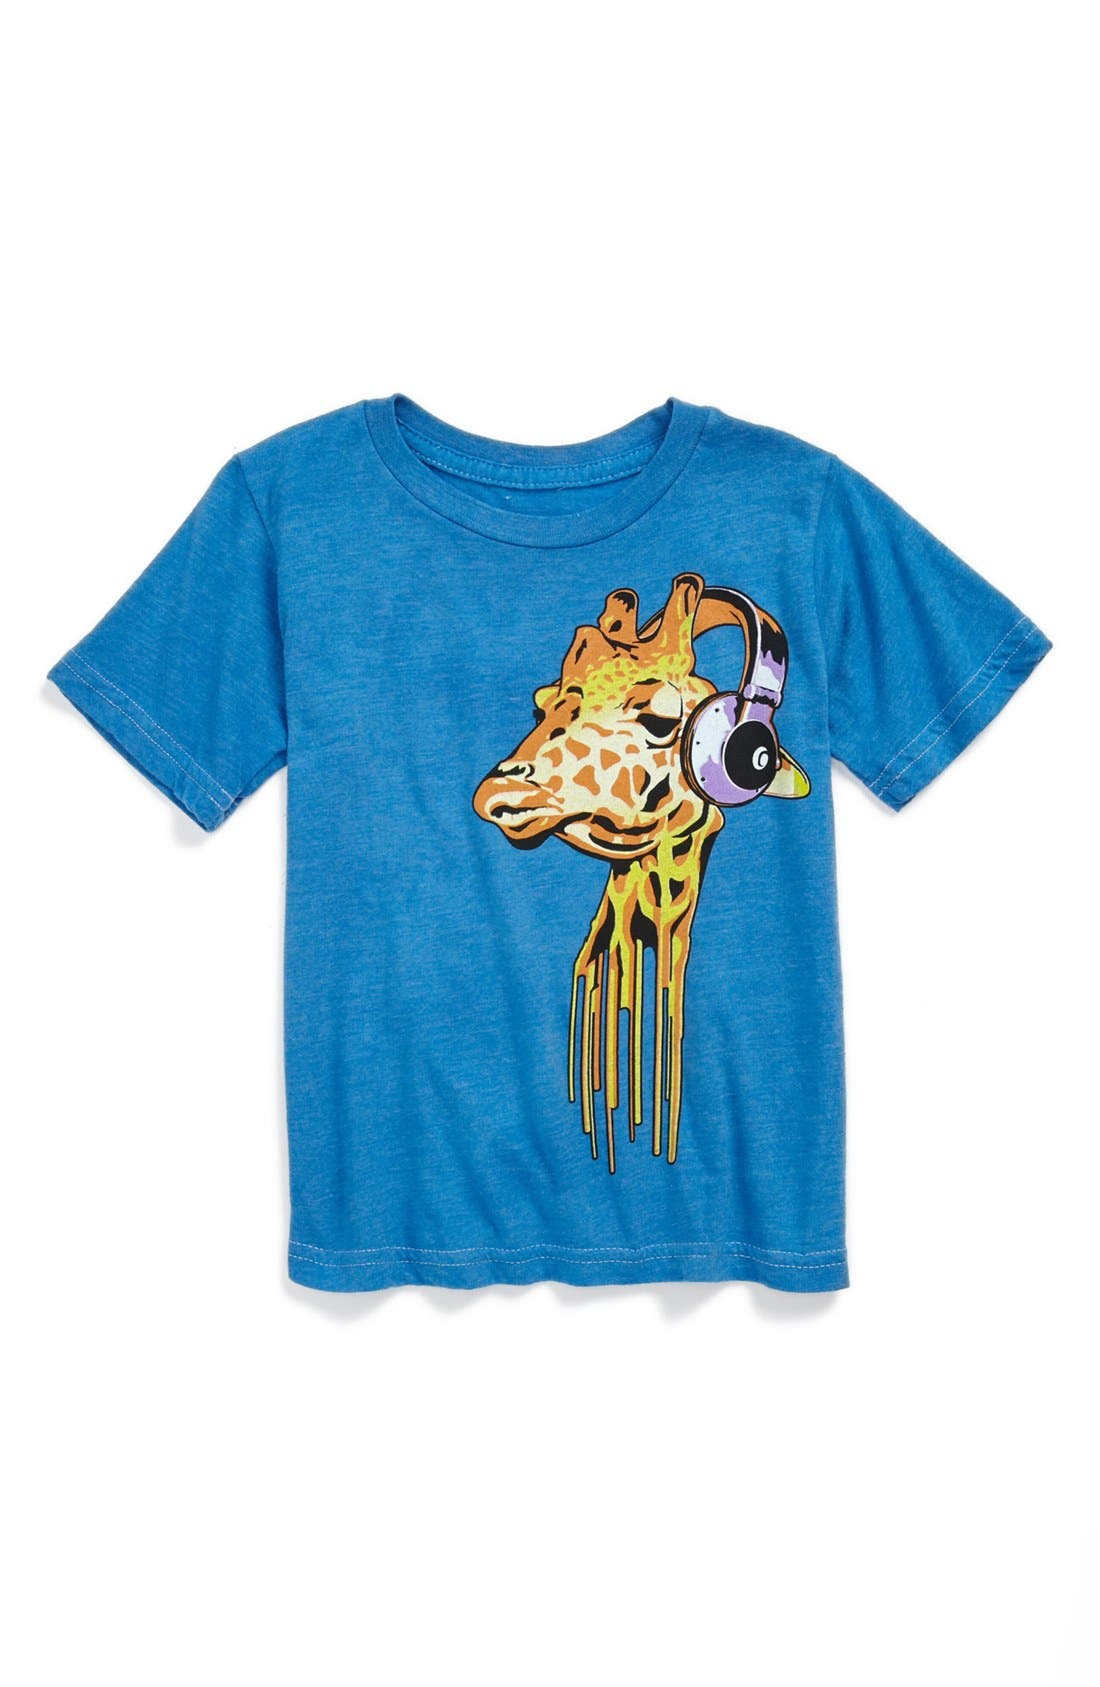 Main Image - Jem 'Heads Up Sky Diver' T-Shirt (Toddler Boys)